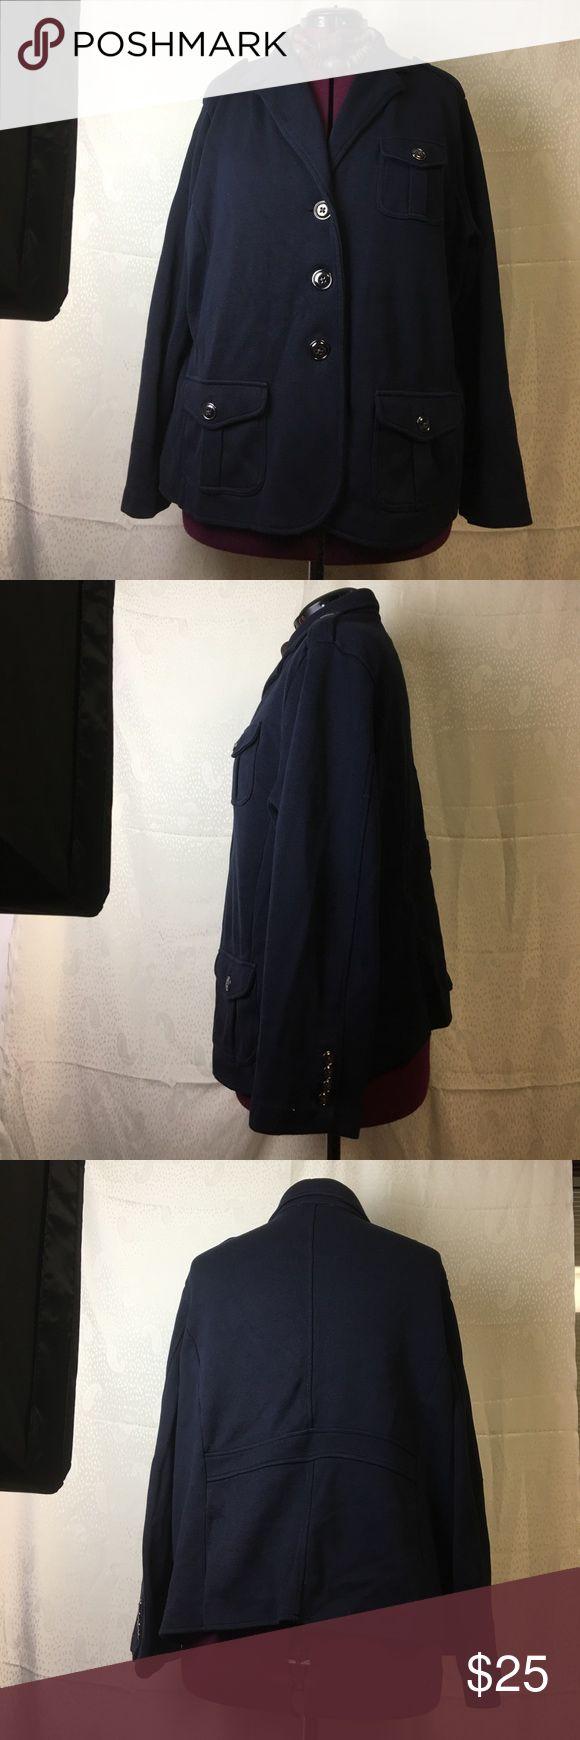 3x Talbots Woman military style blazer navy 3x Talbots Woman military style blazer navy  4 functional pockets 100% cotton Talbots Jackets & Coats Blazers